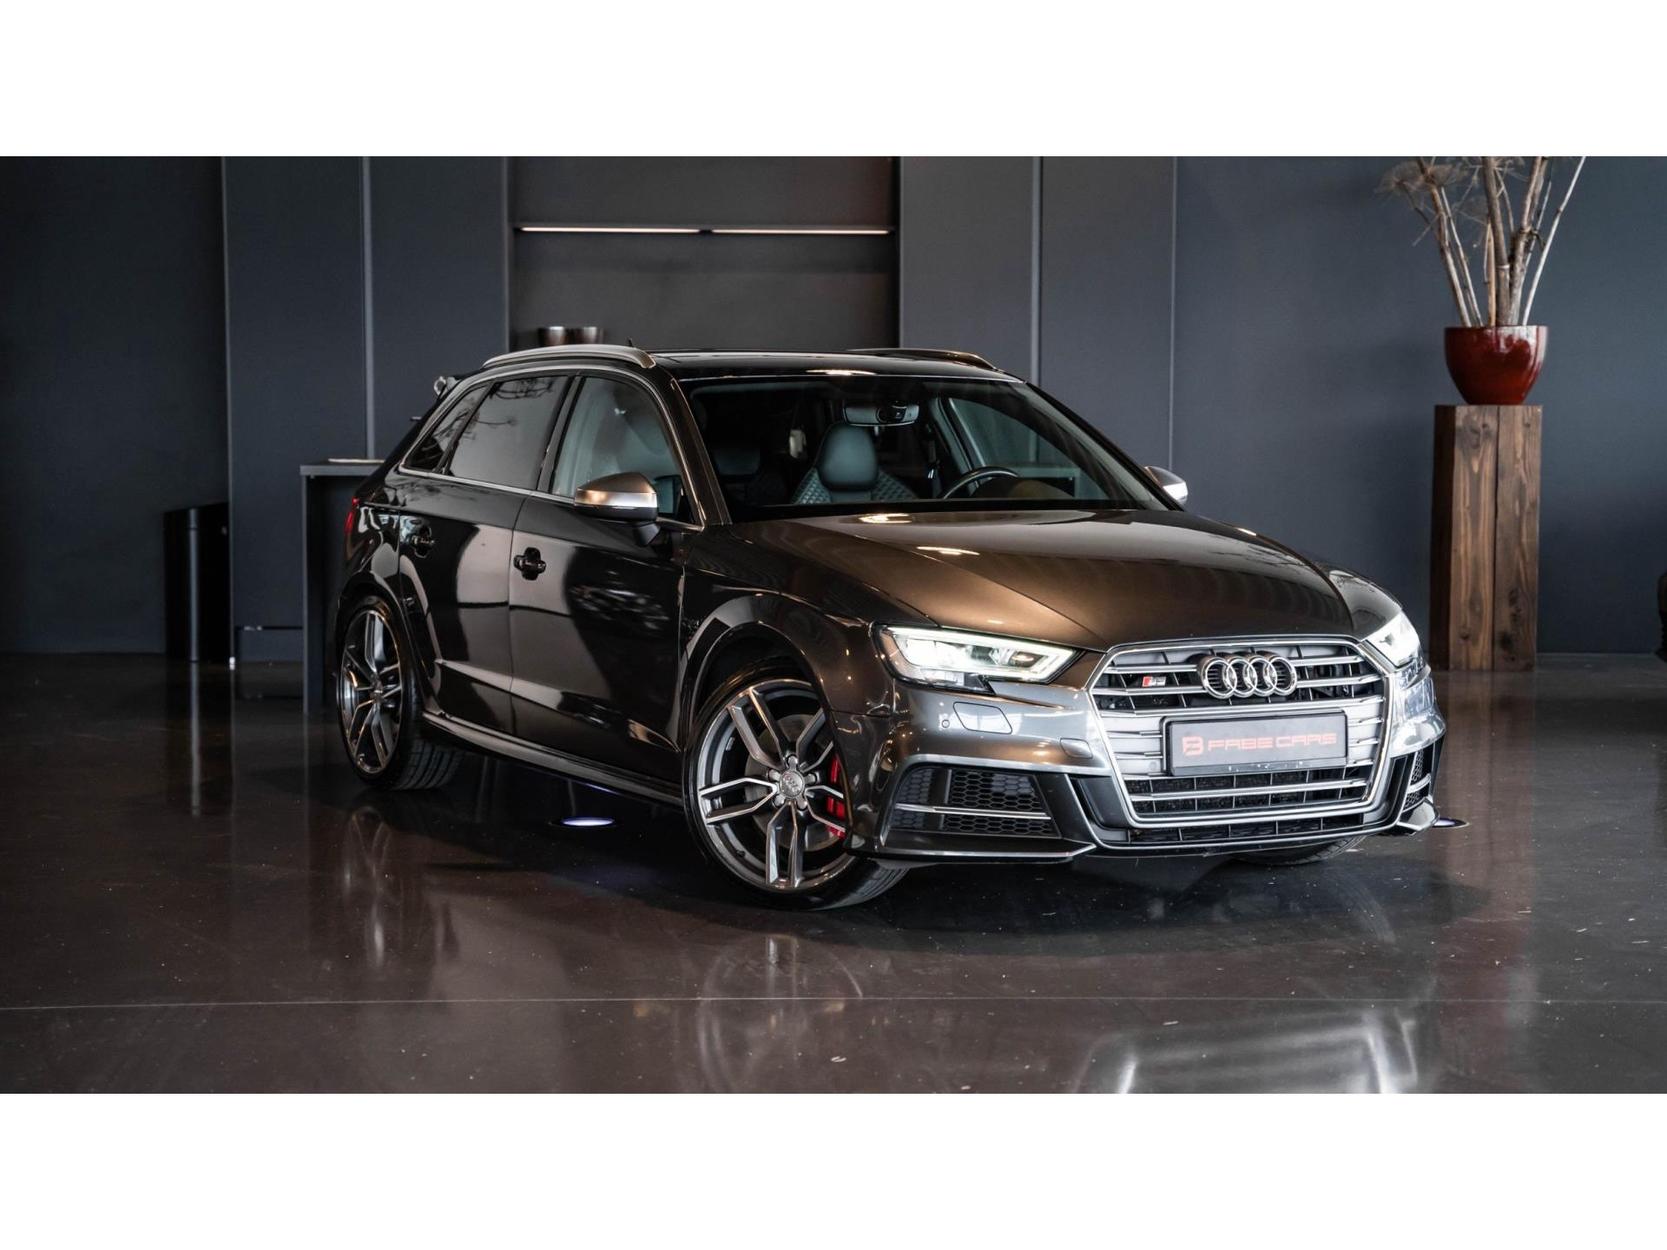 Audi S3 Sportback 2.0 TFSI S3 quattro Pro Line Plus PANORAMA KEYLESS ACC VIRTUEEL-COCKPIT B&O